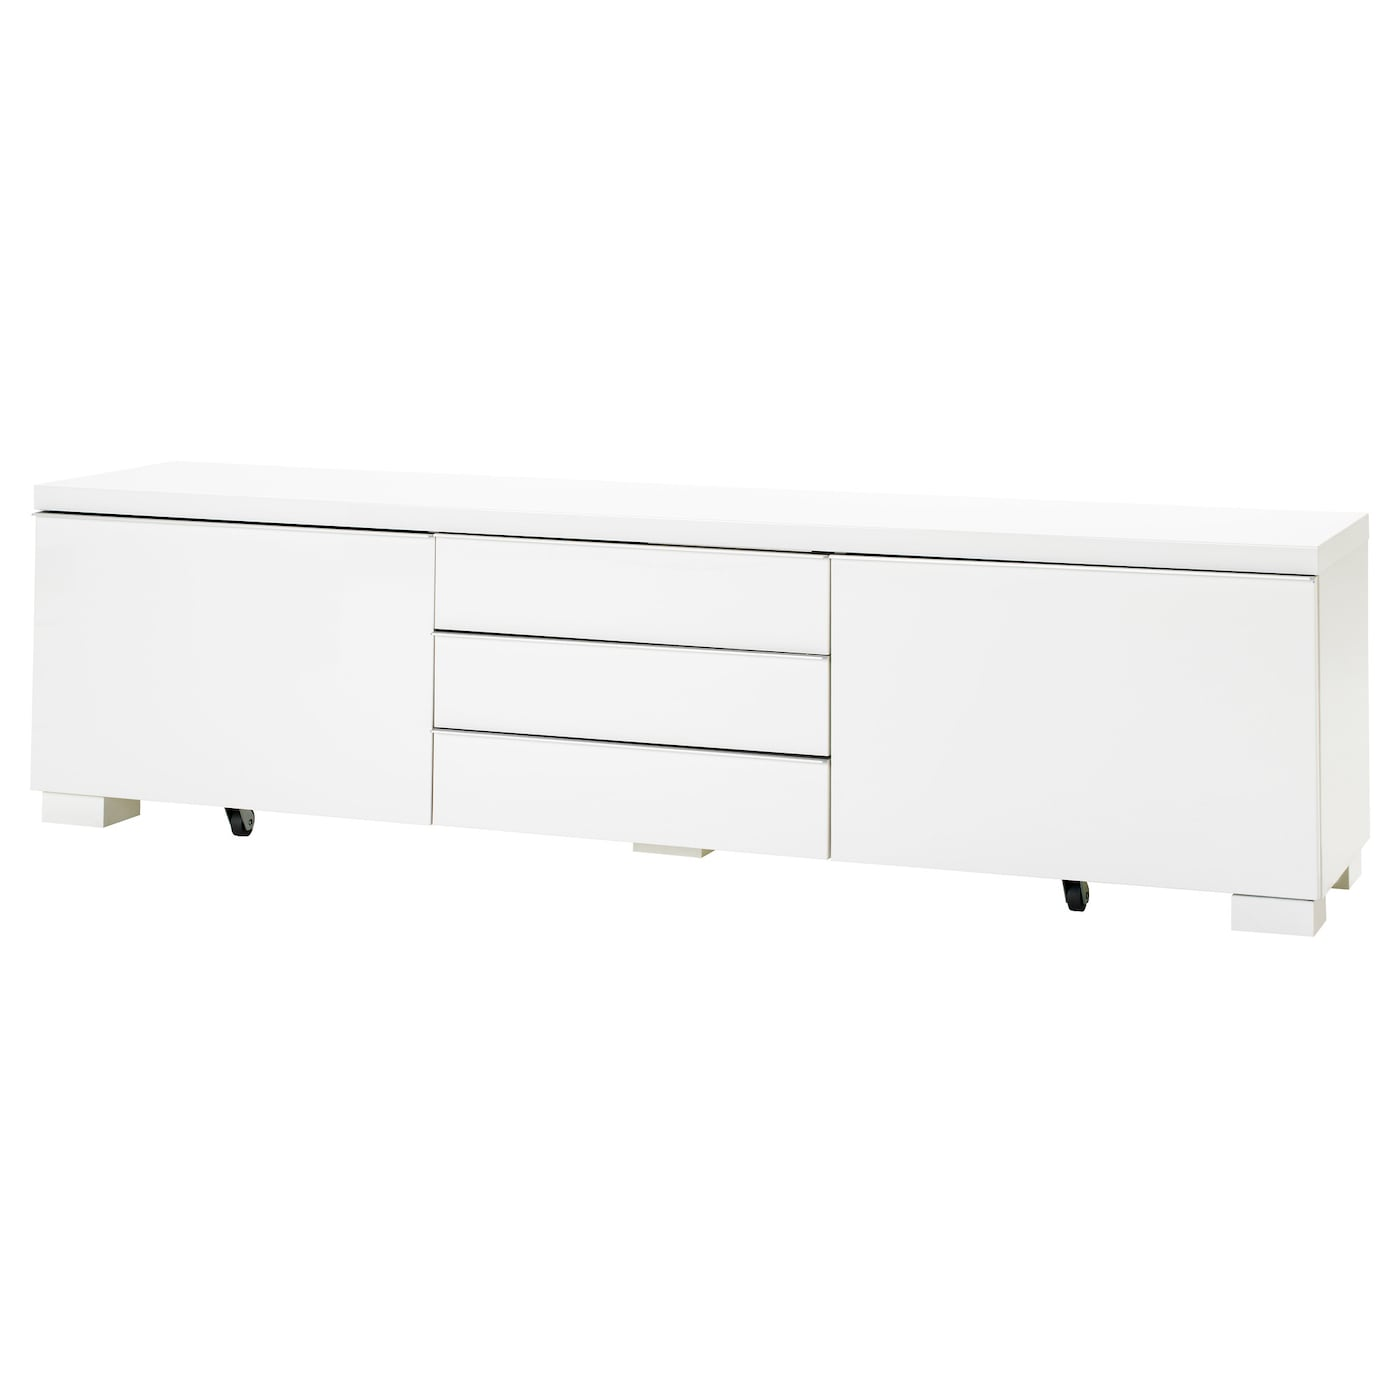 "Meuble Ikea Besta Blanc bestÅ burs tv bench - high gloss white 70 7/8x16 1/8x19 1/4 "" (180x41x49 cm)"